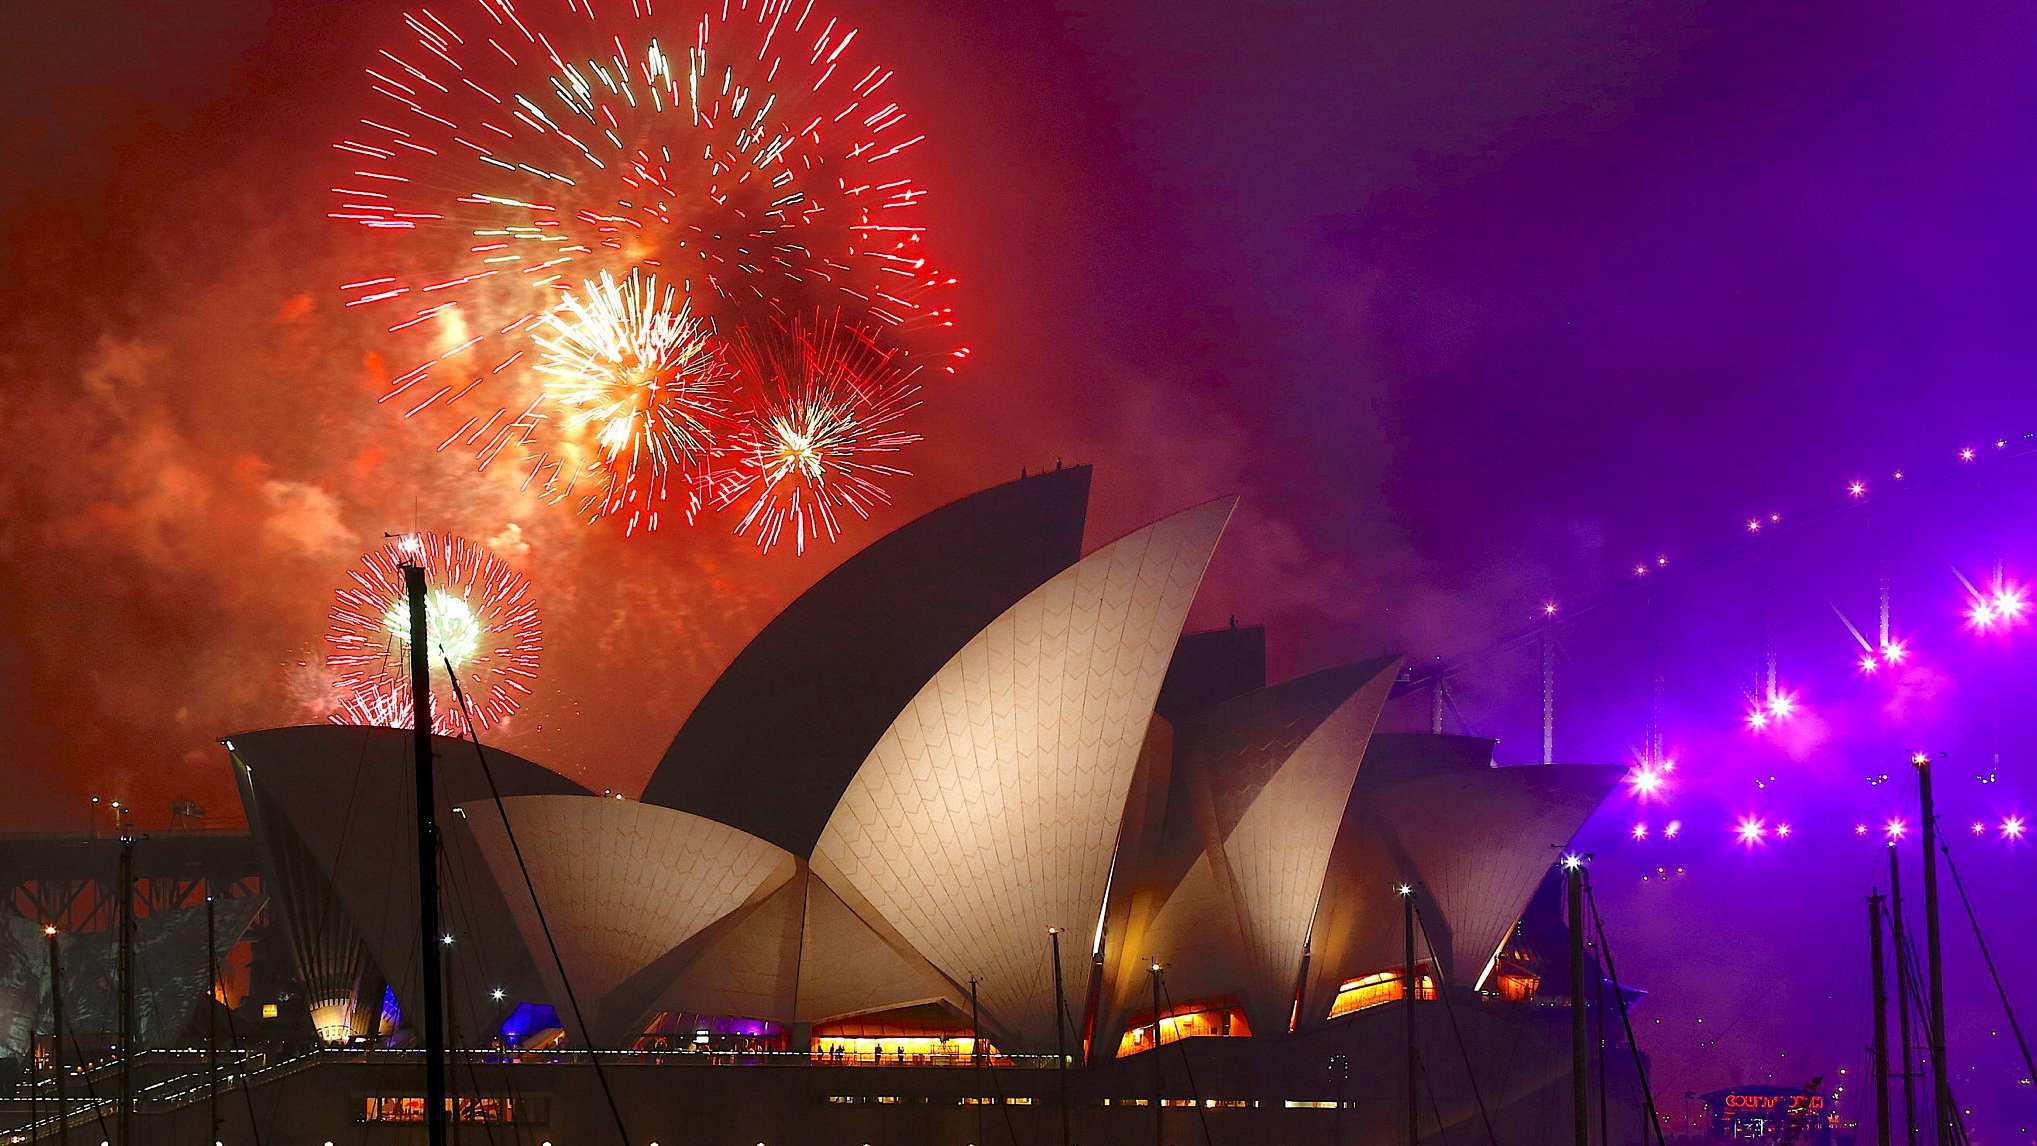 2020 Lunar New Year festival to return to Sydney bigger than ever